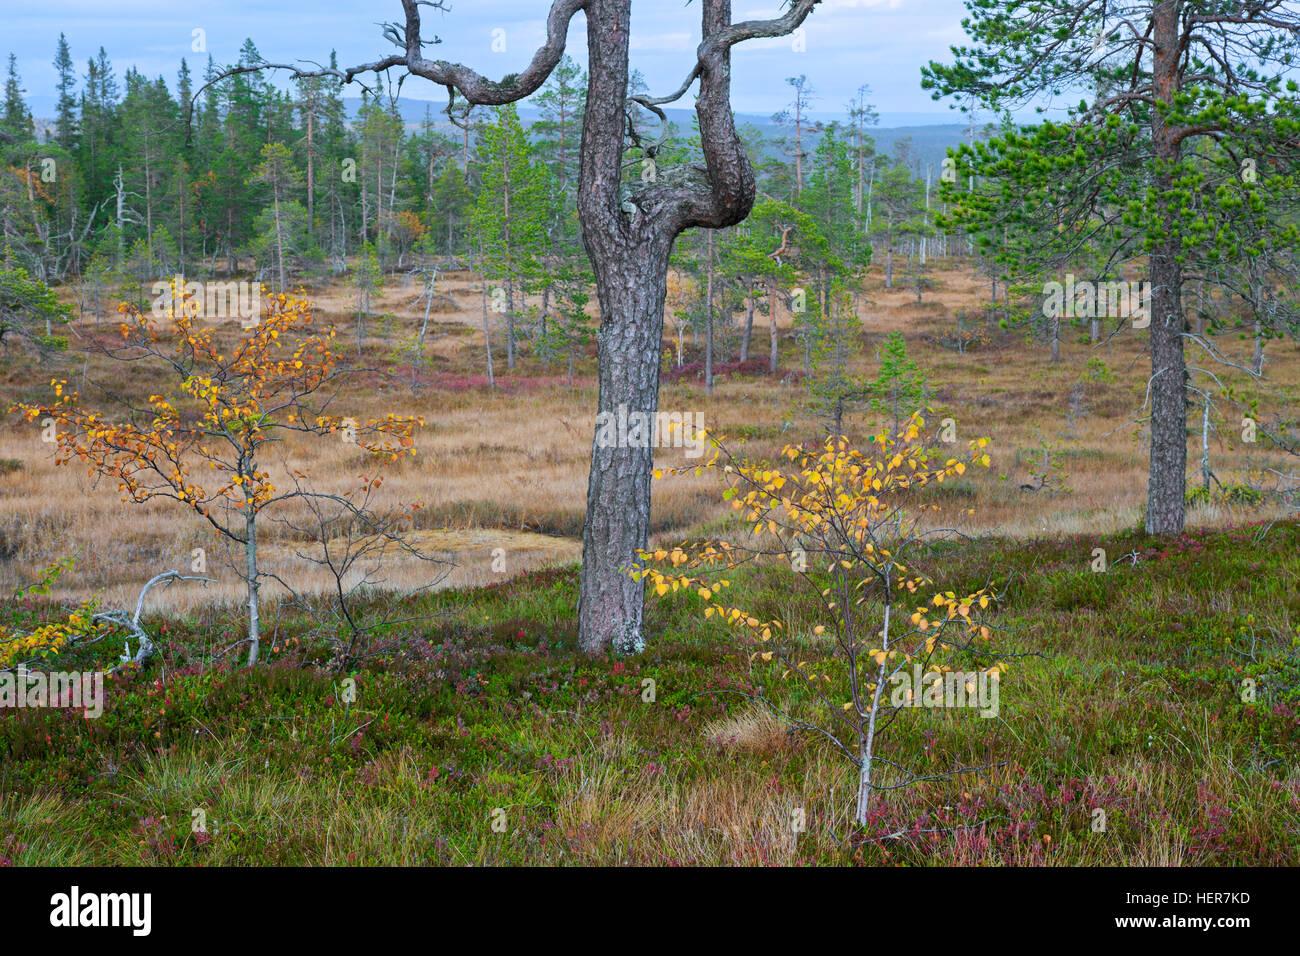 Old Scots pine (Pinus sylvestris) trees in moorland, Fulufjaellet / Fulufjället National Park, Älvdalen, - Stock Image